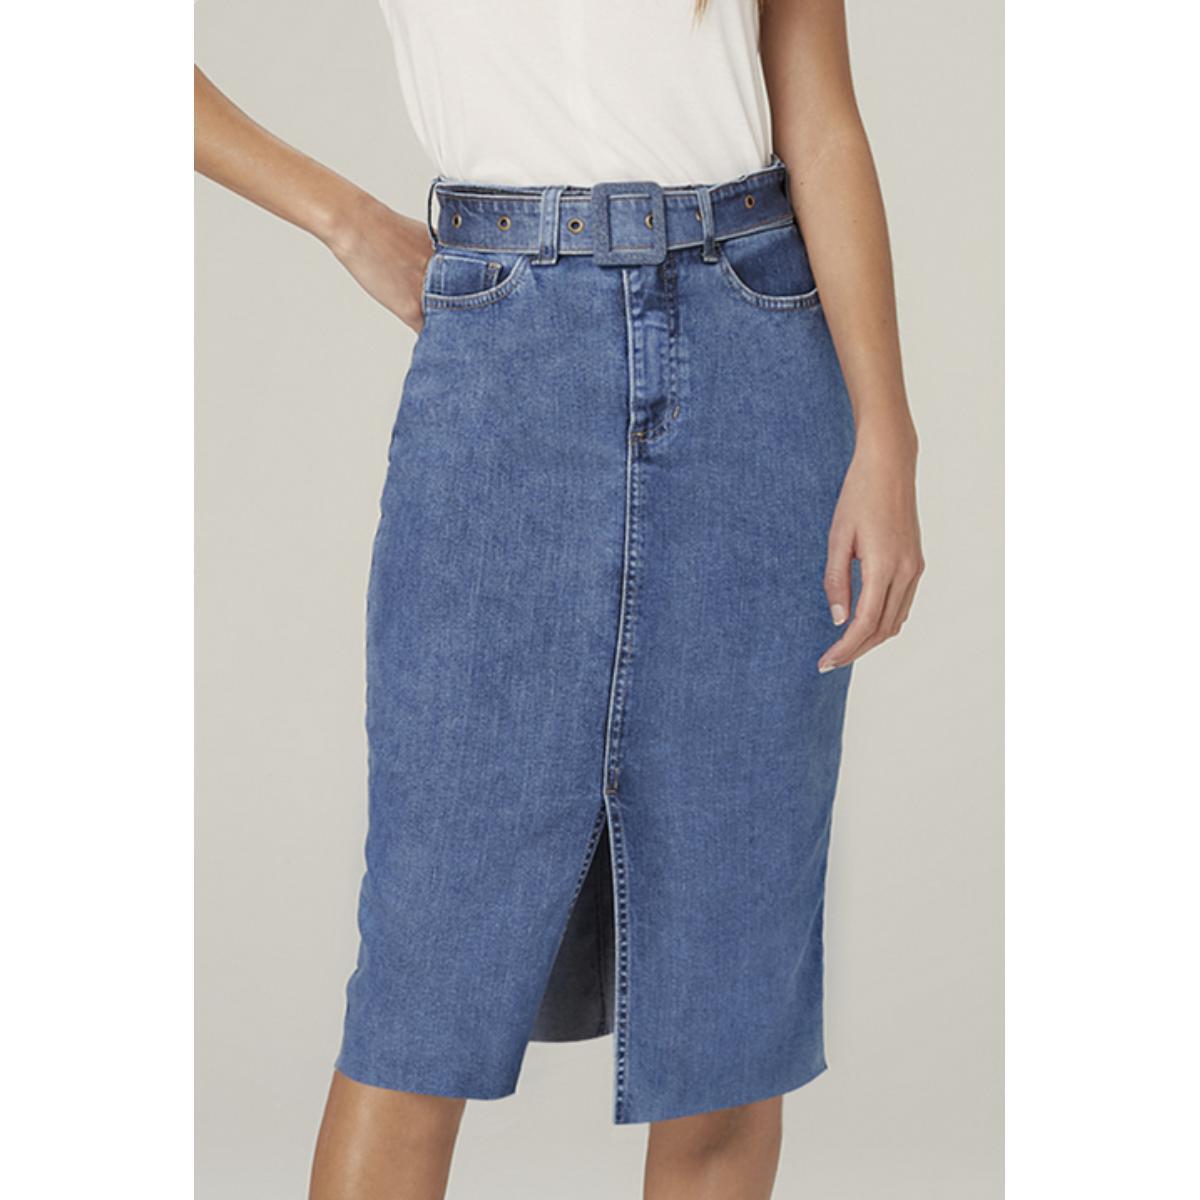 Saia Feminina Dzarm Zc3f 1asn Jeans